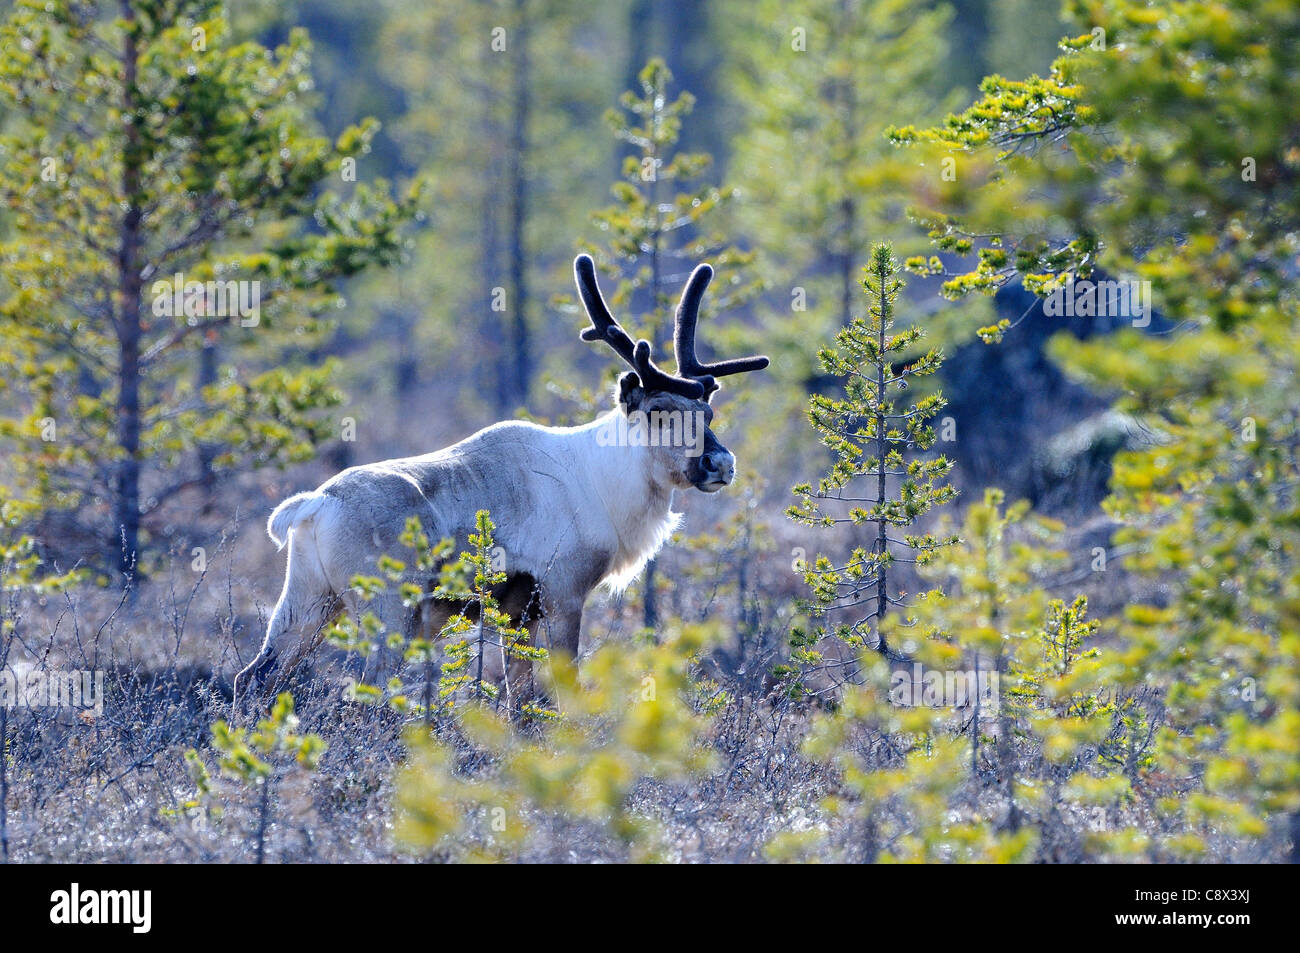 Reindeer (Rangifer tarandus) standing in taiga forest, Finland - Stock Image